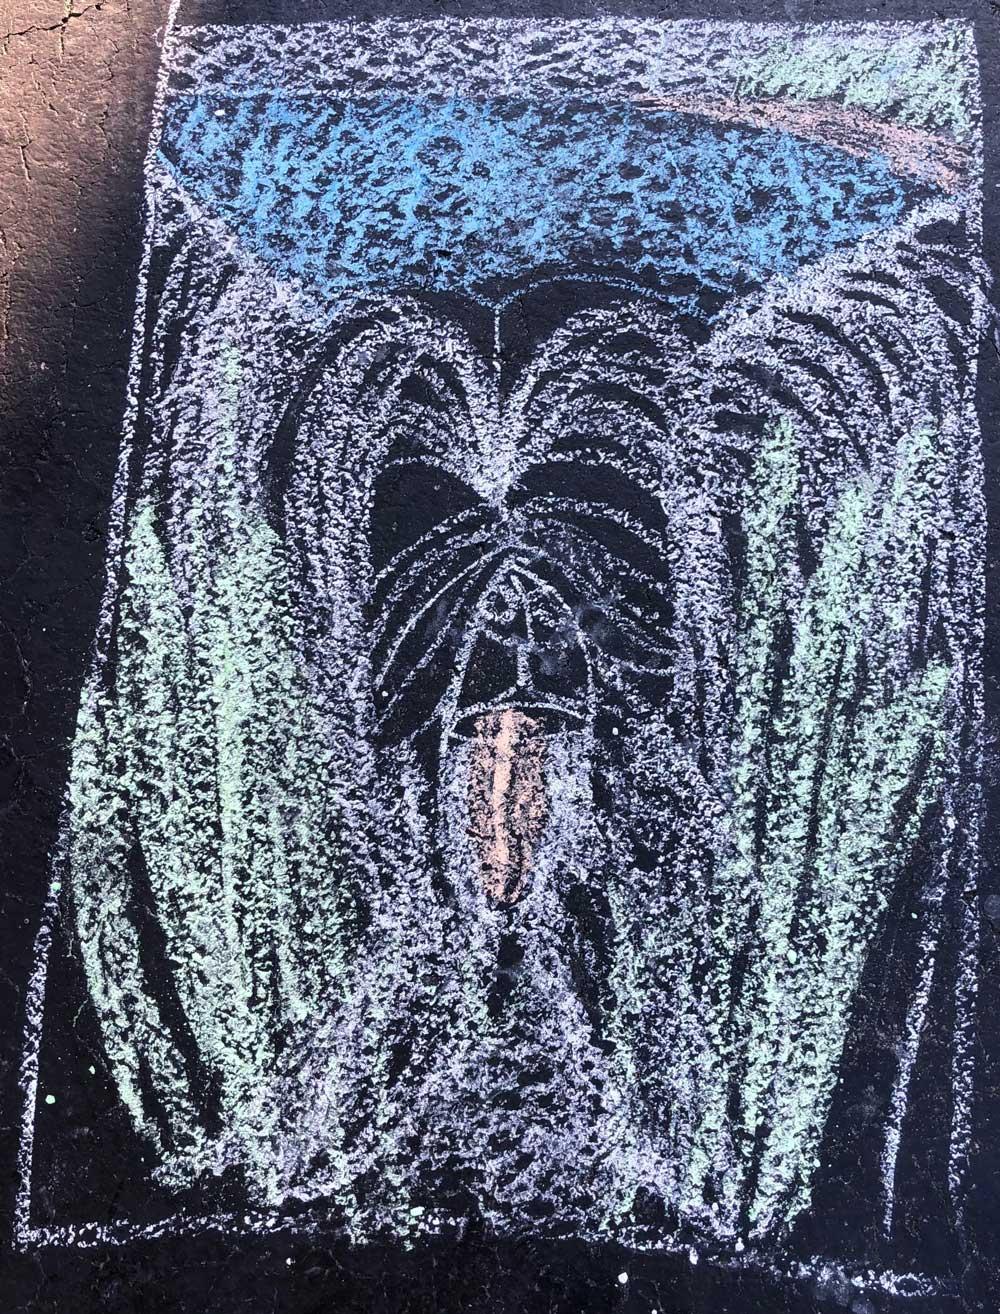 Children's sidewalk chalk drawing of Sunny the shaggy dog